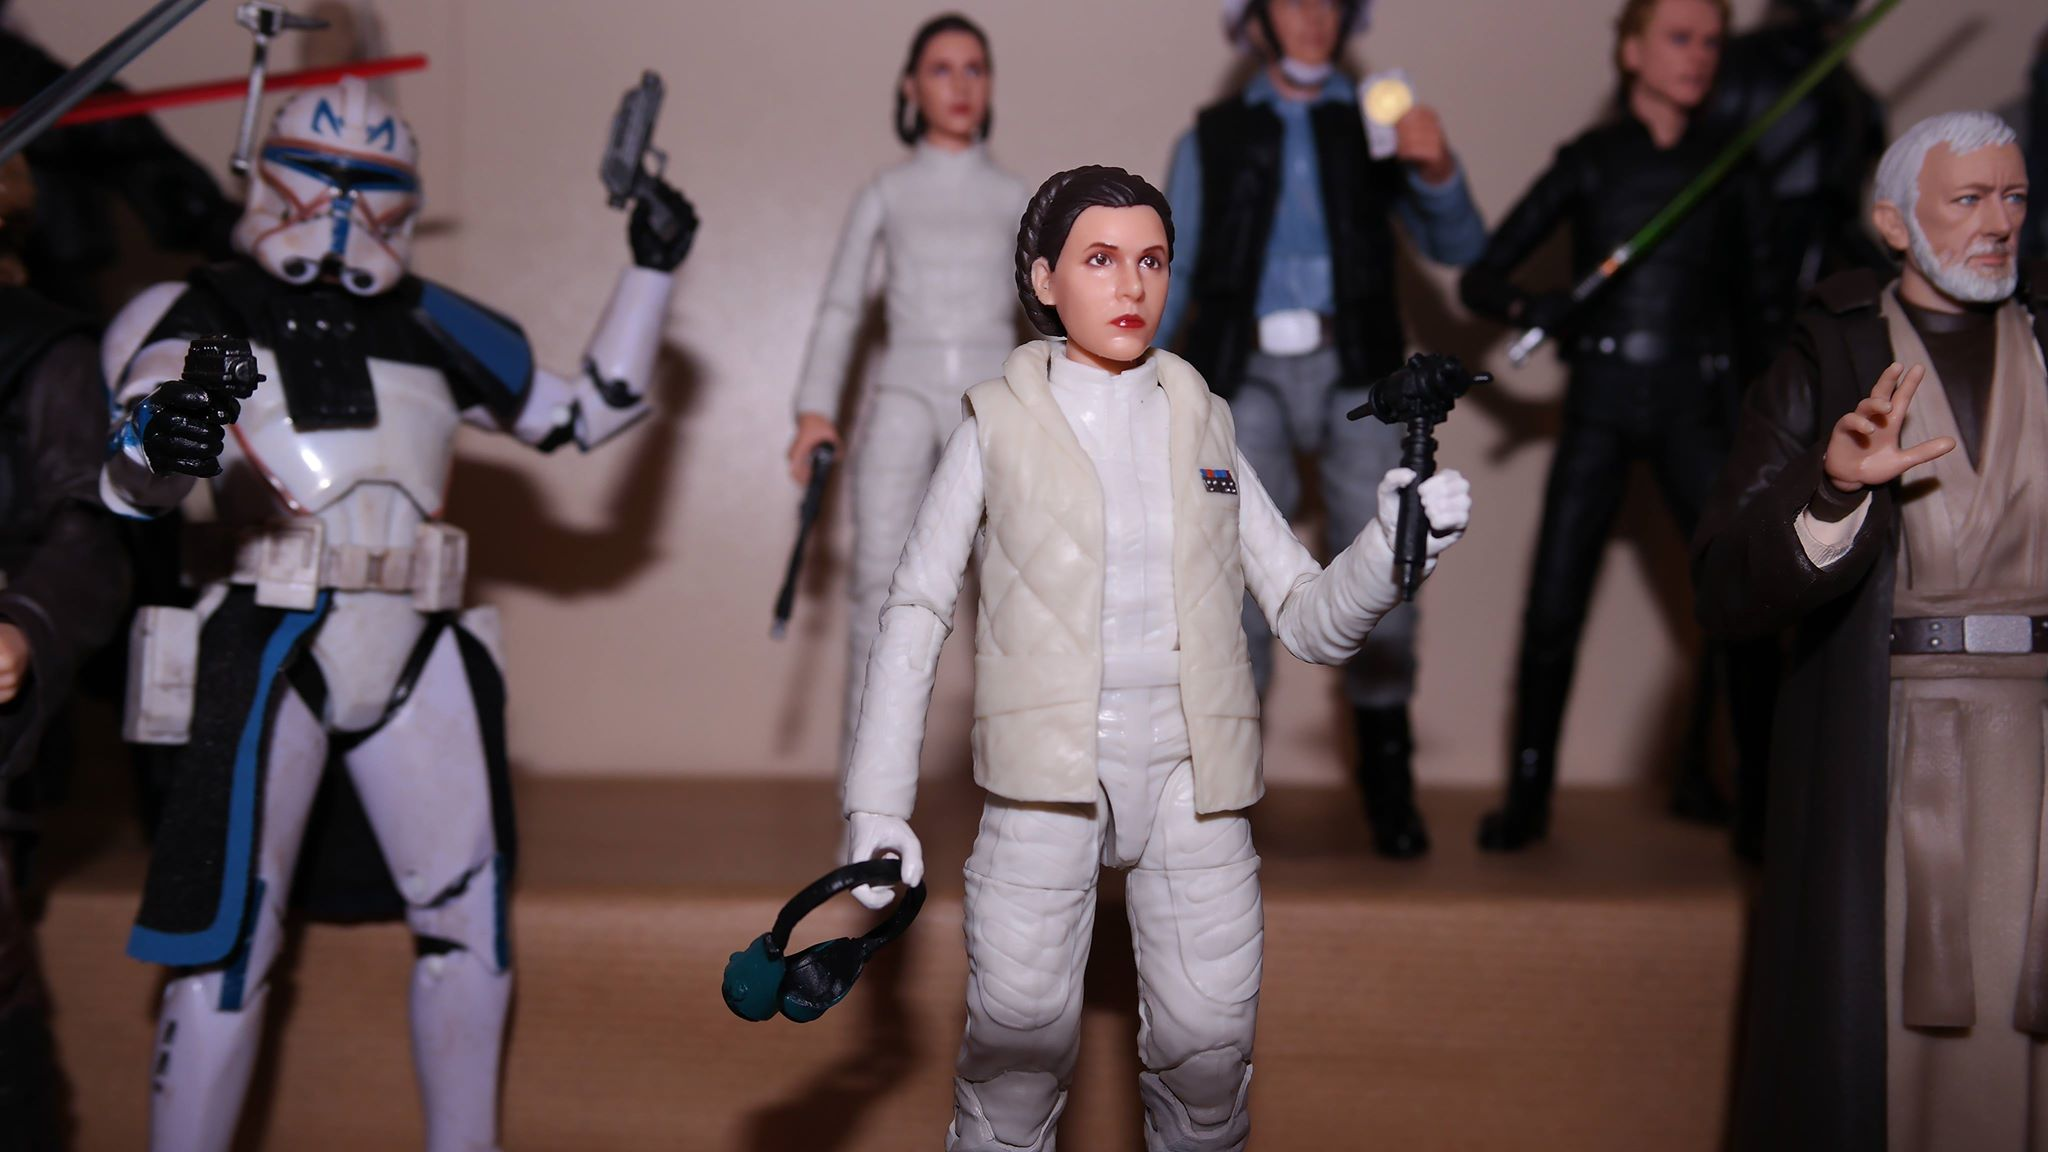 Leia, The Display Of The Future